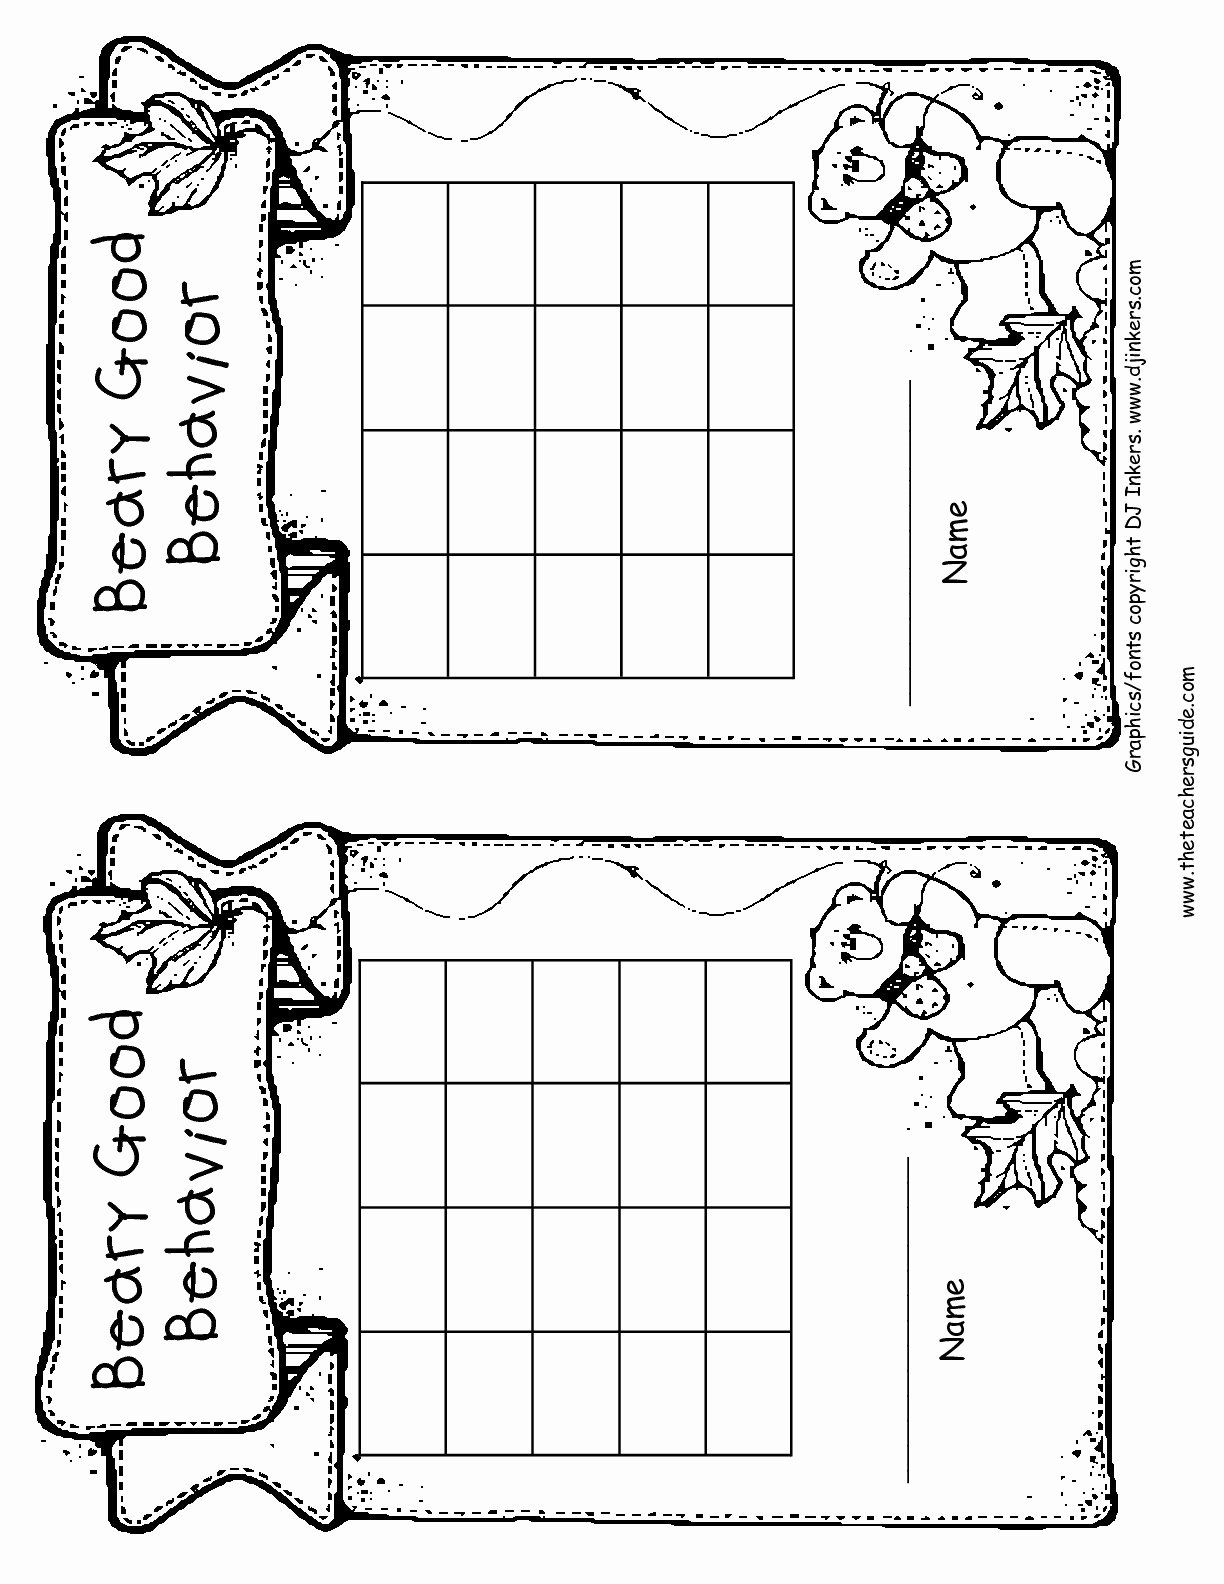 30 Classroom Behavior Chart Template In